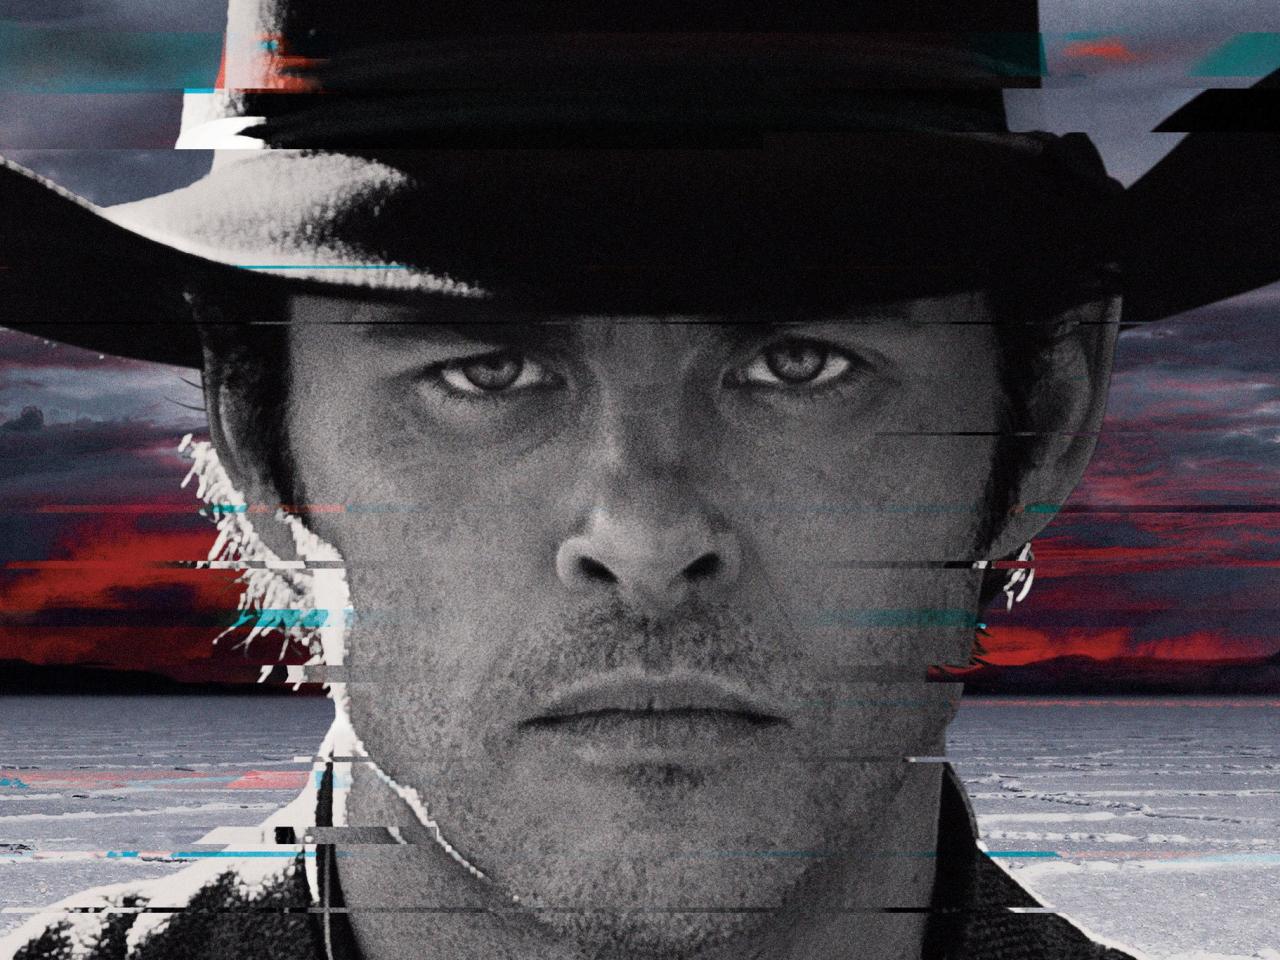 James Marsden, Teddy Flood, Westworld, season 2, tv show, 1280x960 wallpaper